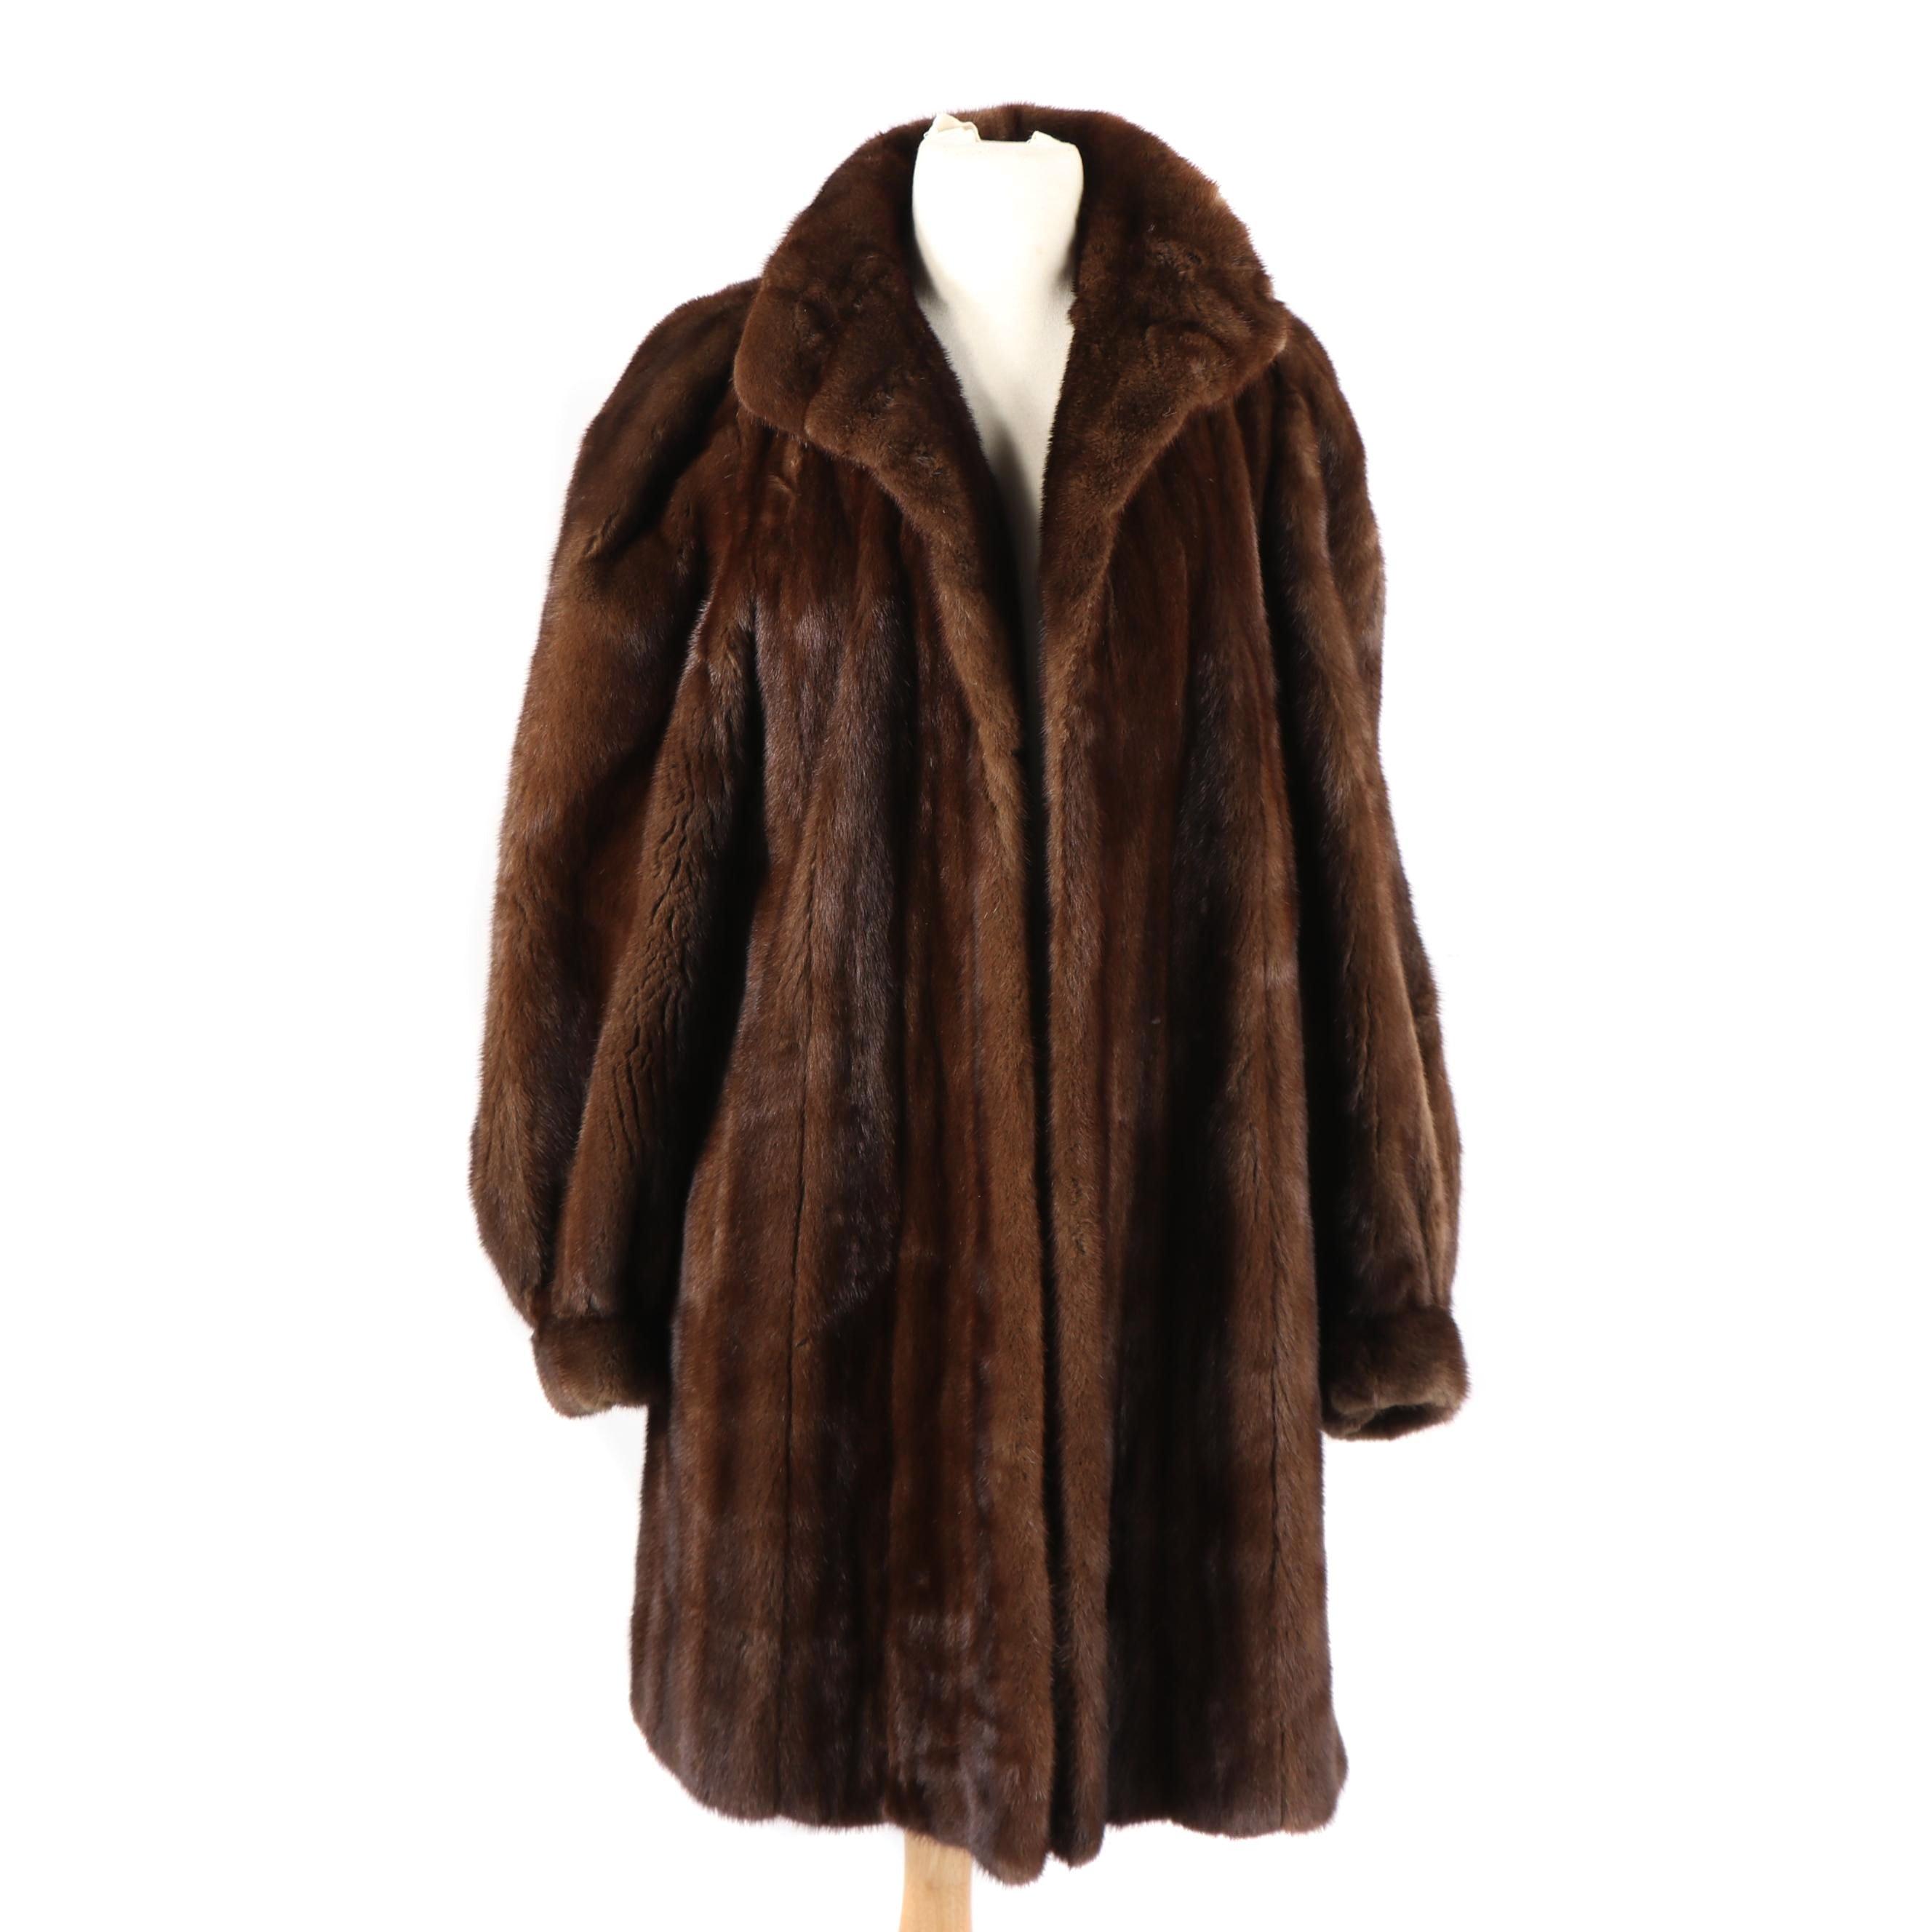 Vintage Szor-Diener Mink Fur Coat